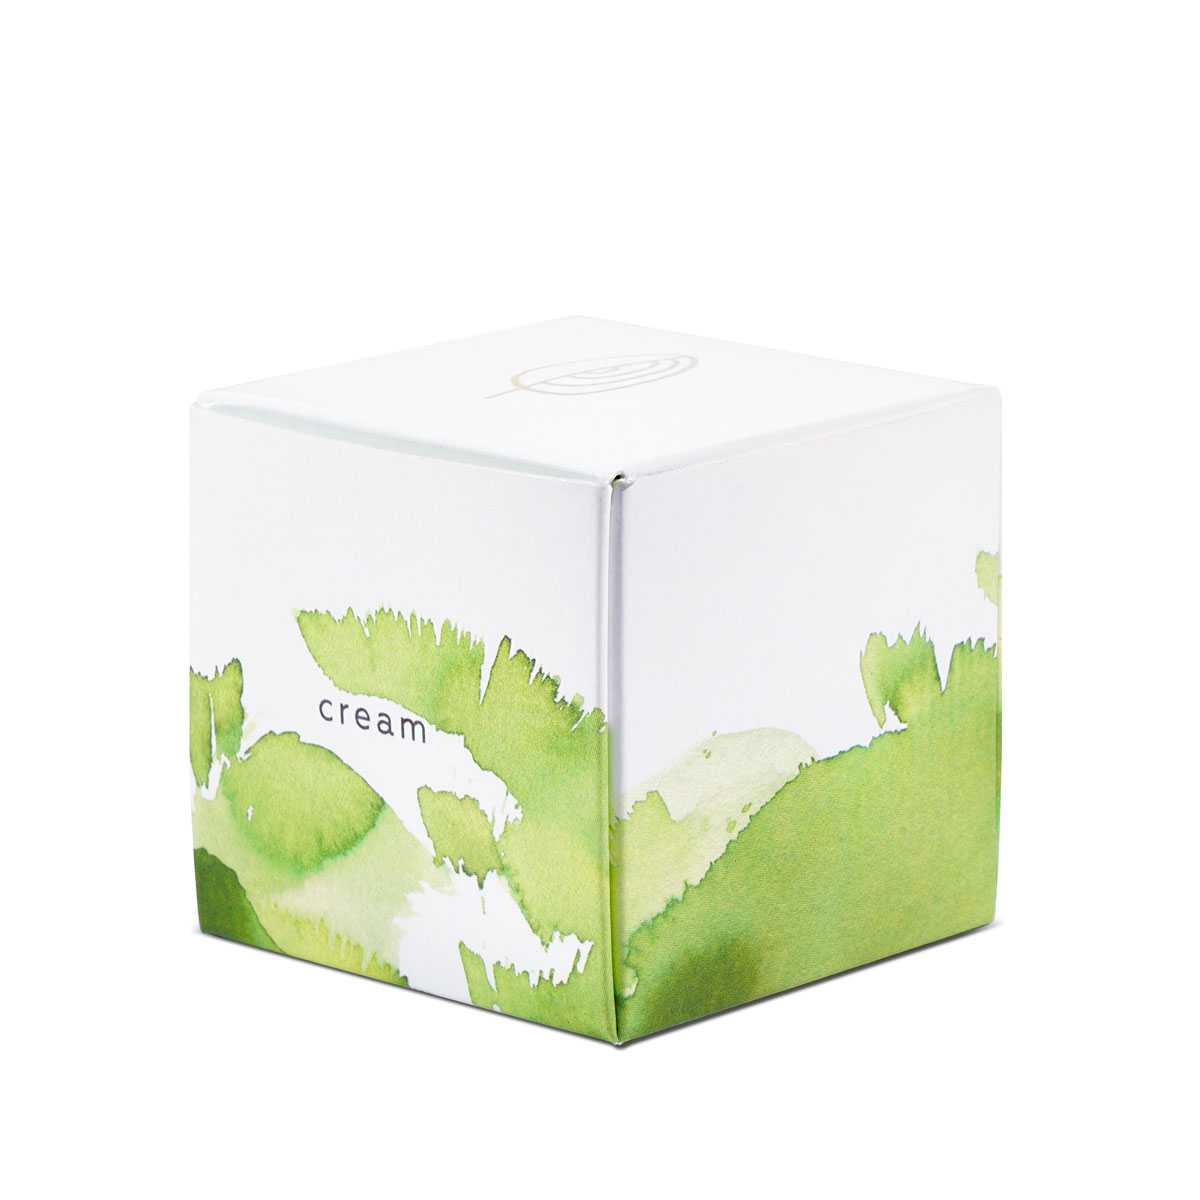 petit-collection-web-cream